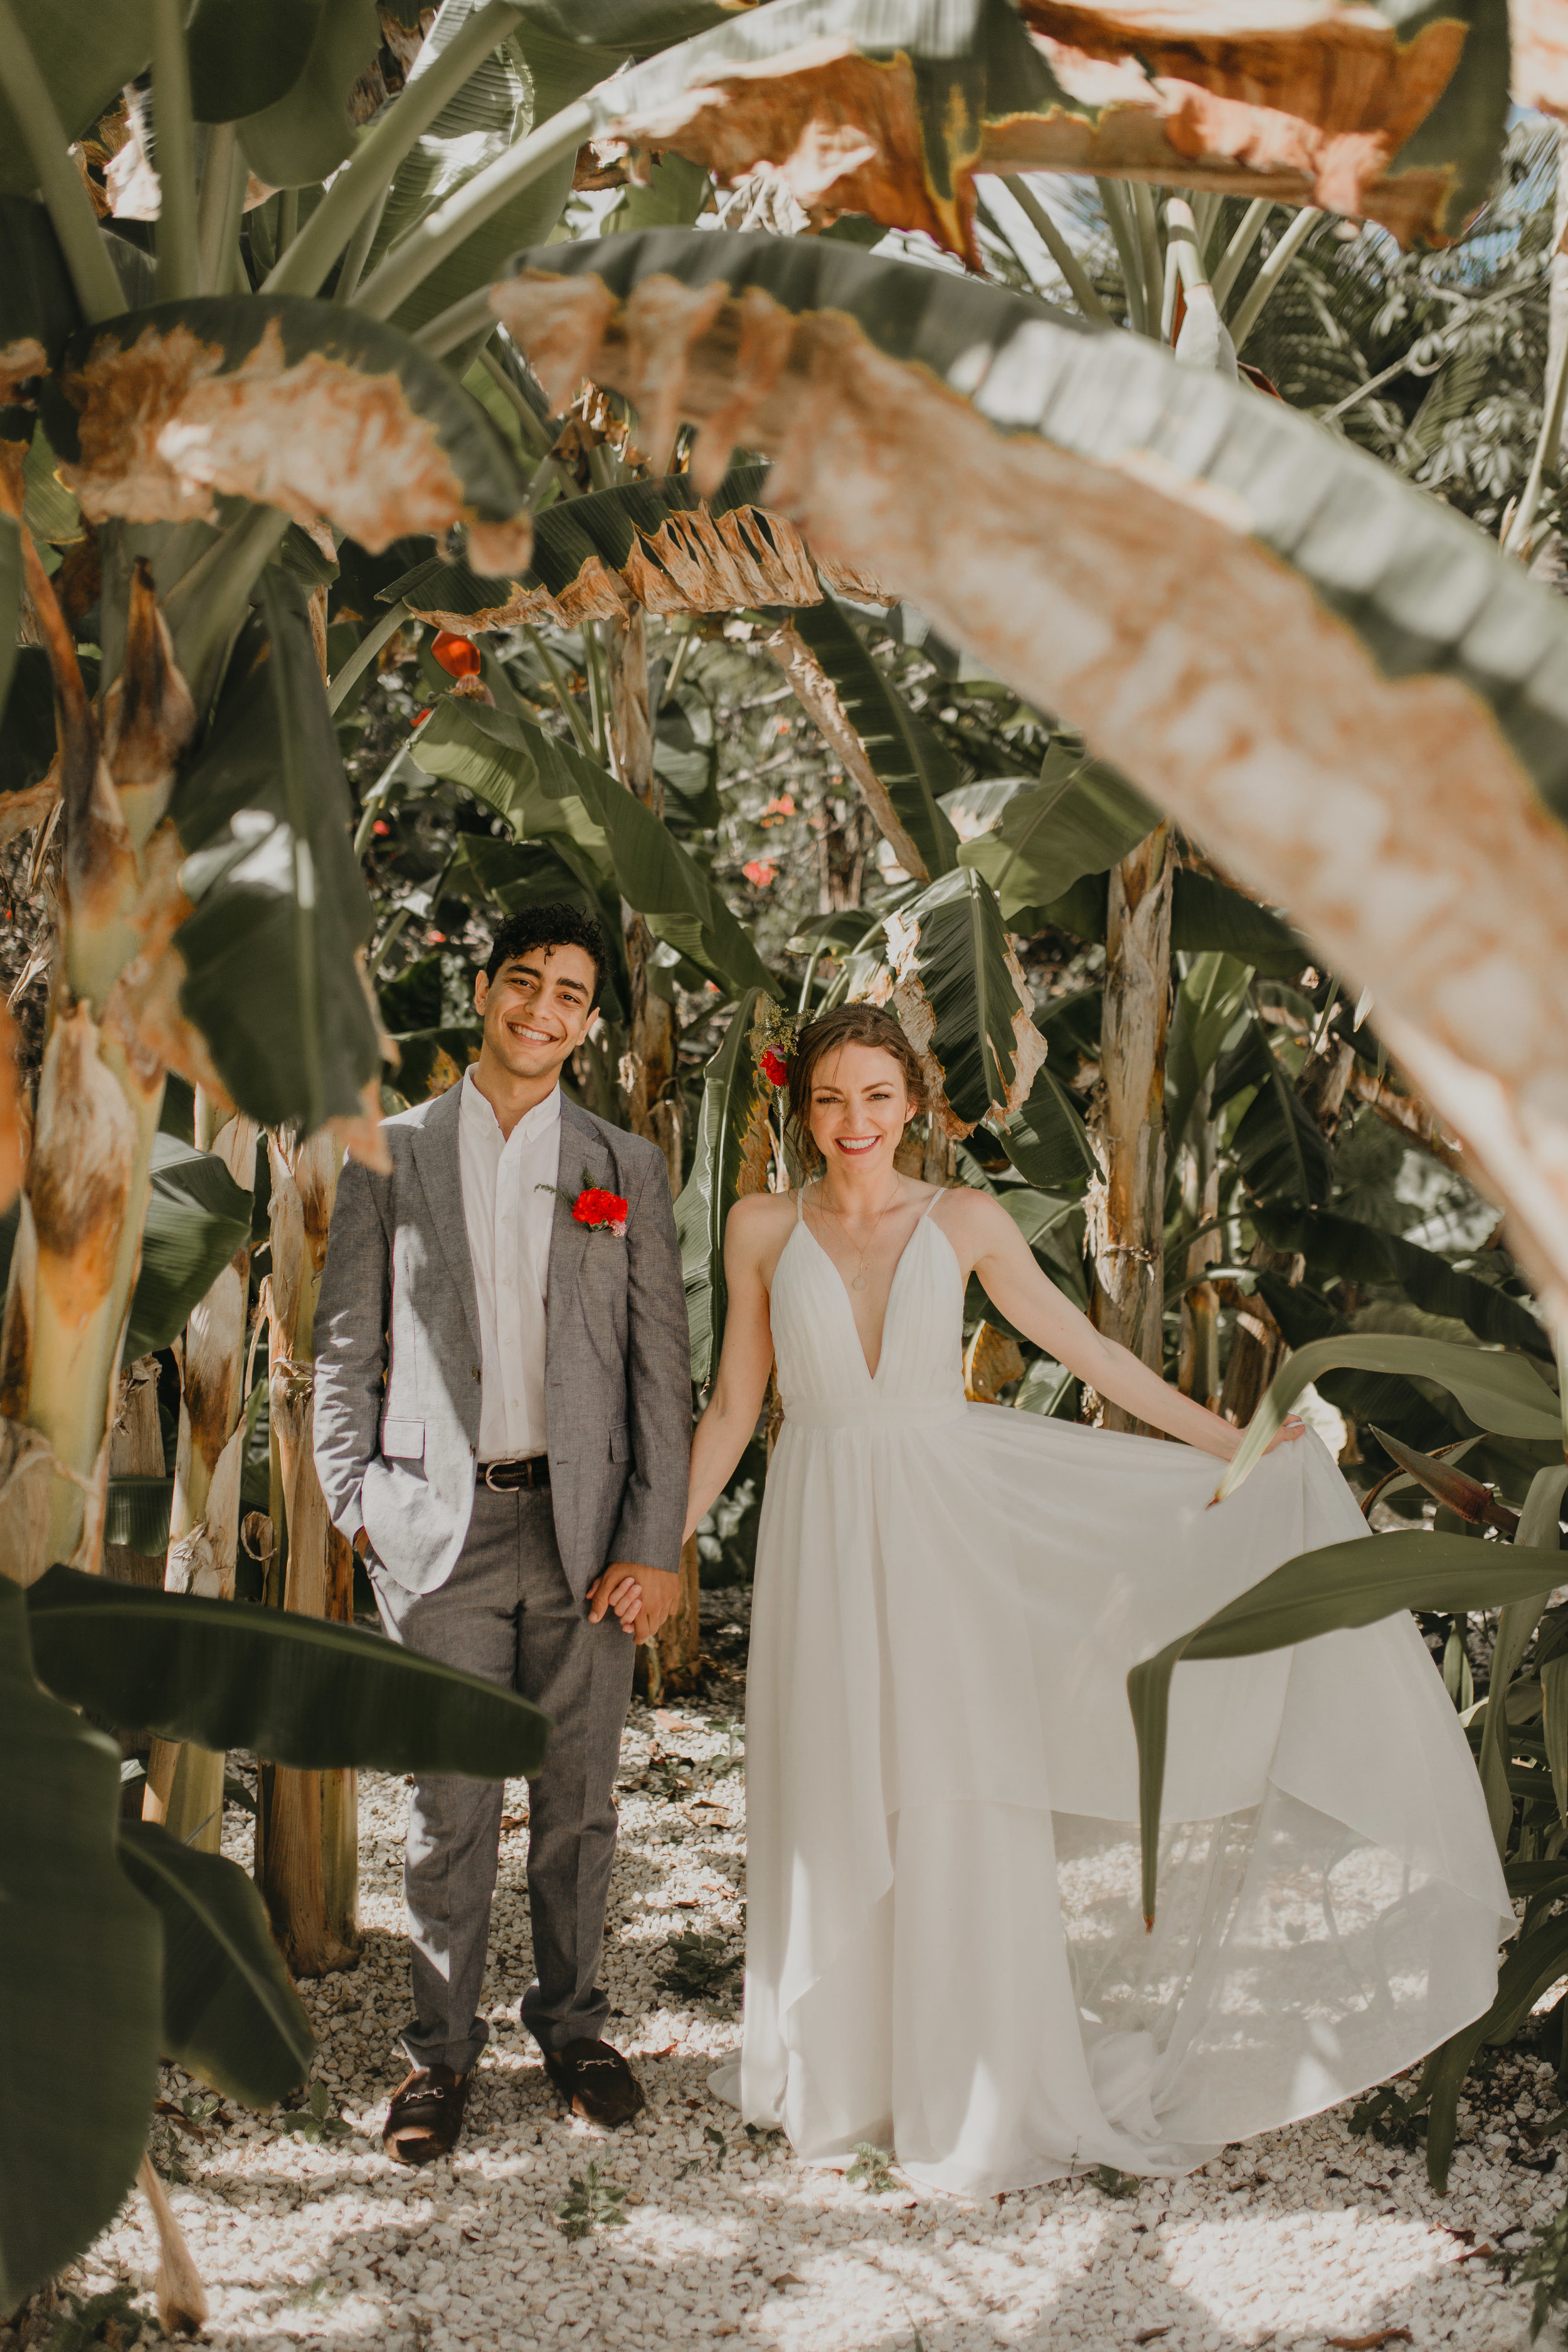 Nicole-Daacke-Photography-beachfront-akumal-destionation-wedding-tulum-mexico-elopement-photographer-destination-wedding-inspiration-sunset-champagne-pop-boho-bride-ocean-tropical-bohemian-tulum-wedding-photos-112.jpg